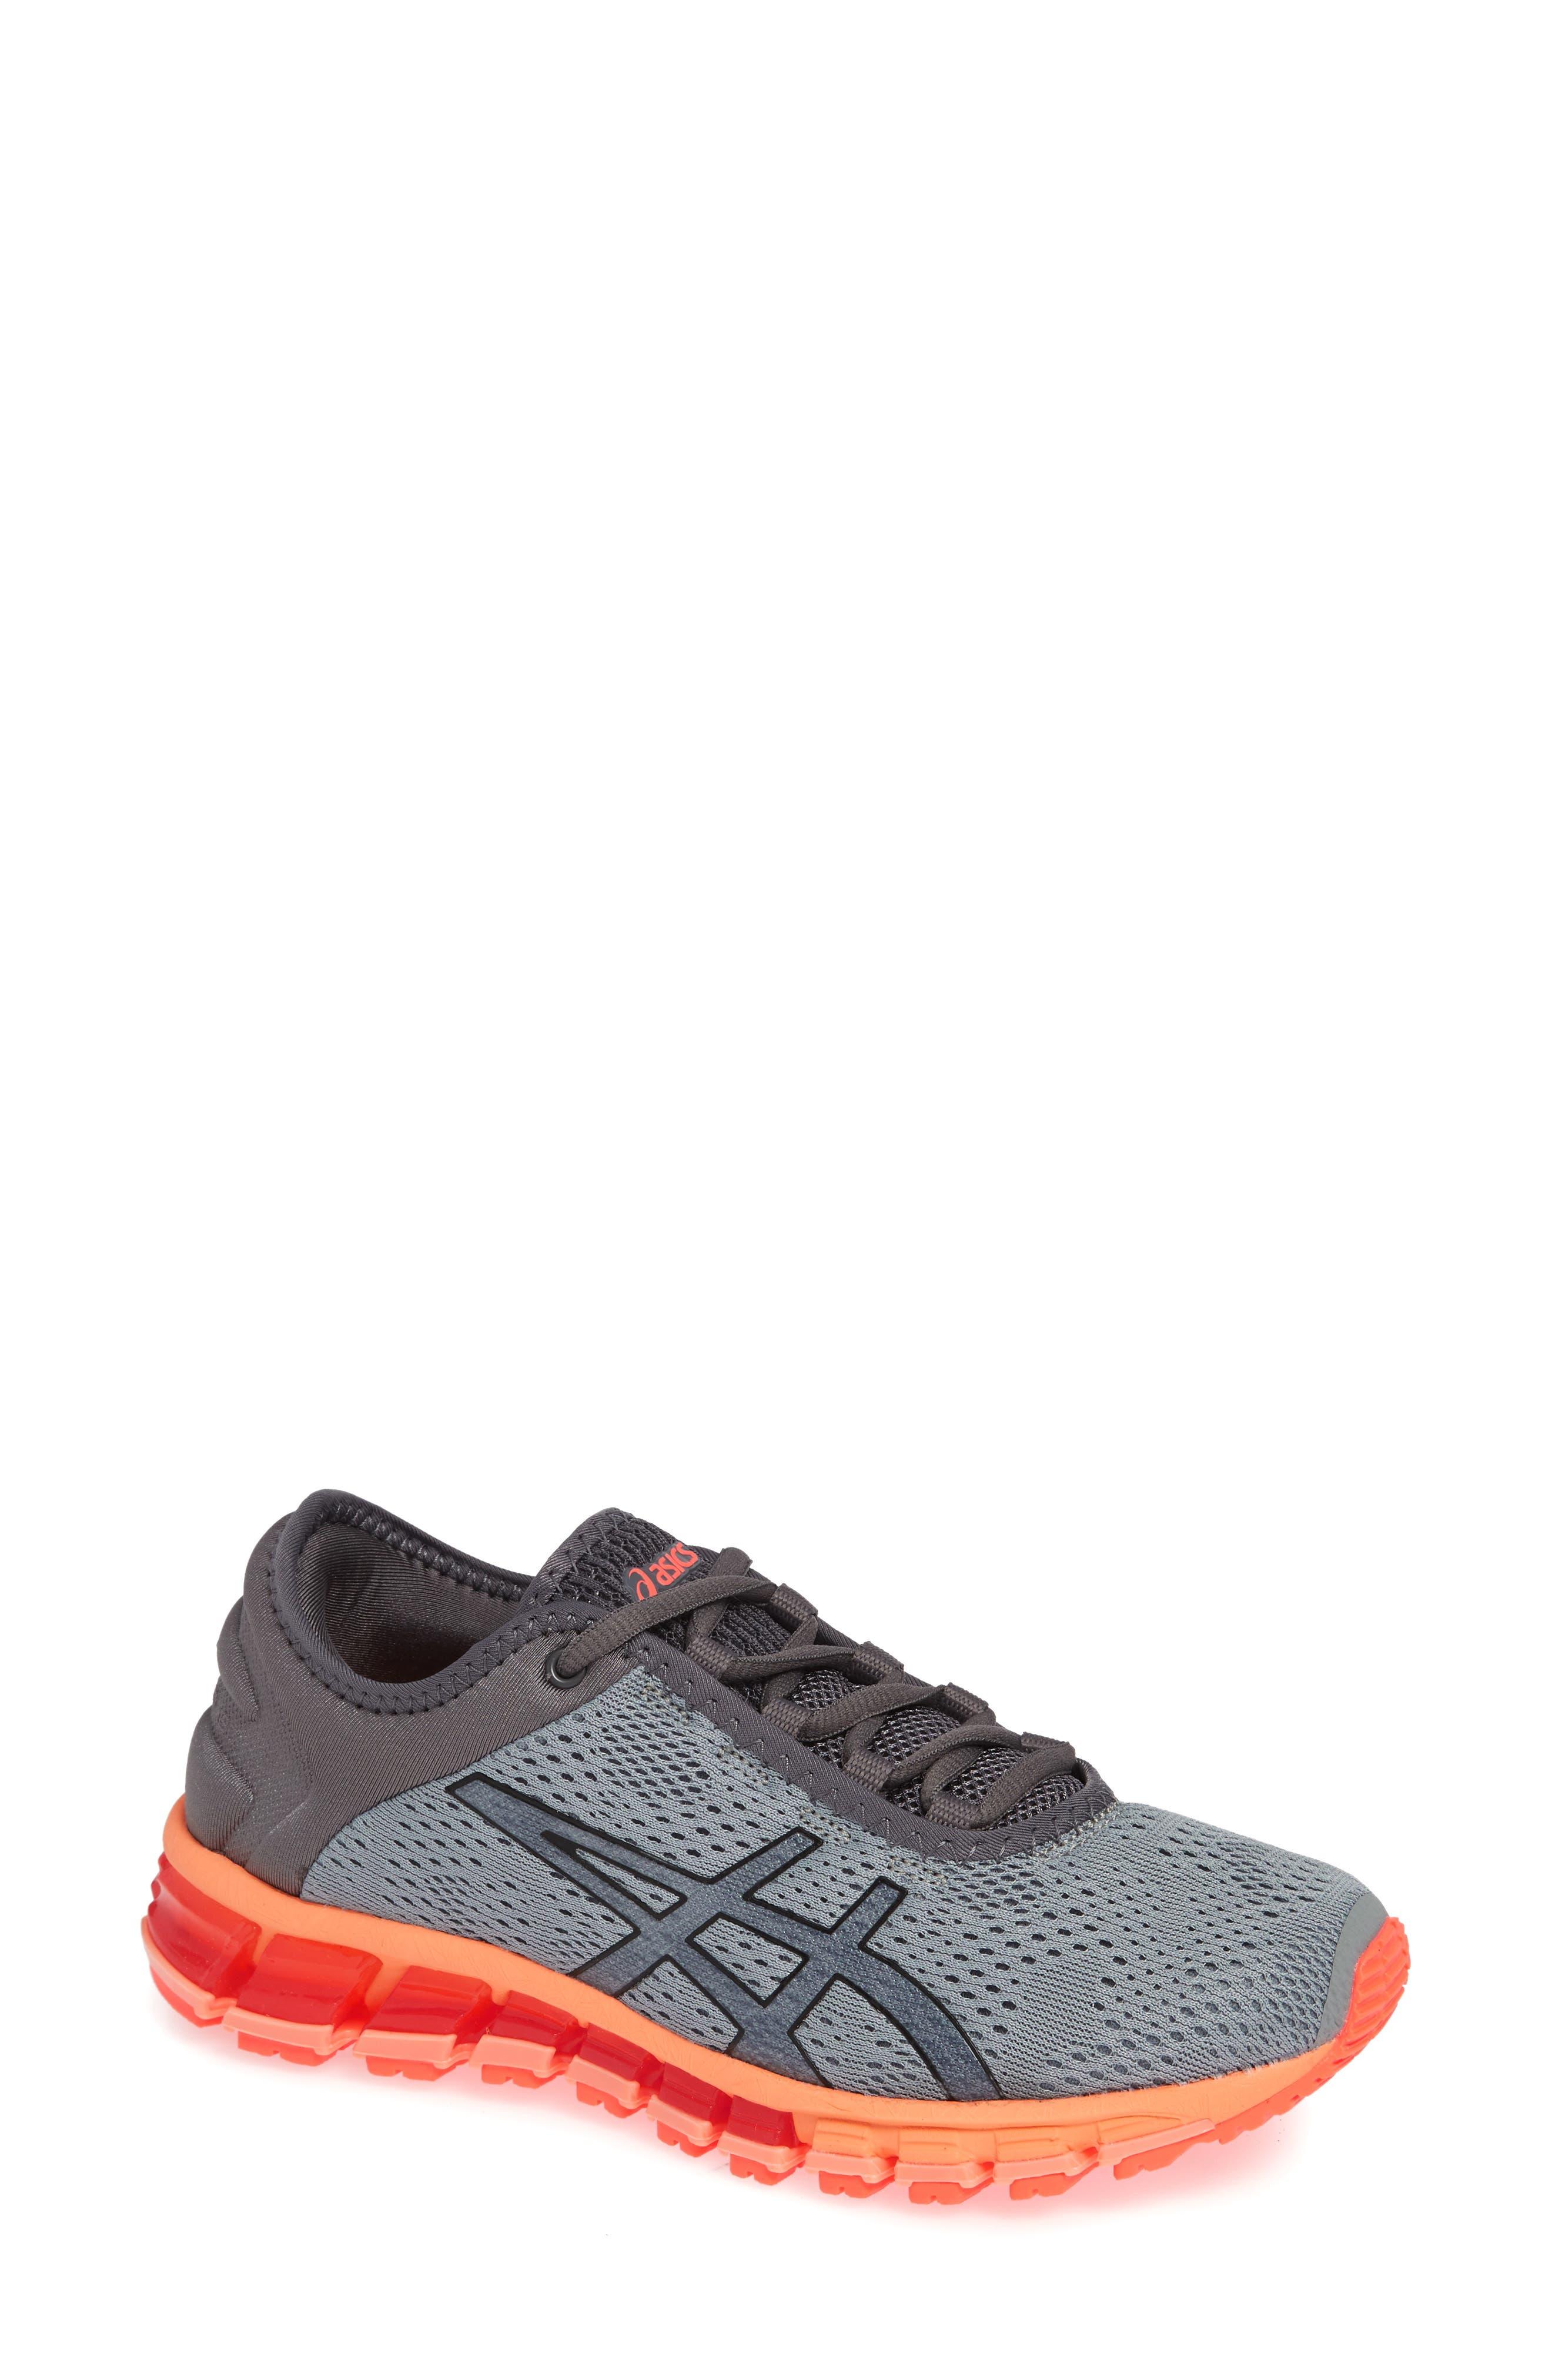 GEL Quantum 180 3 Running Shoe,                             Main thumbnail 1, color,                             STONE GREY/ CARBON